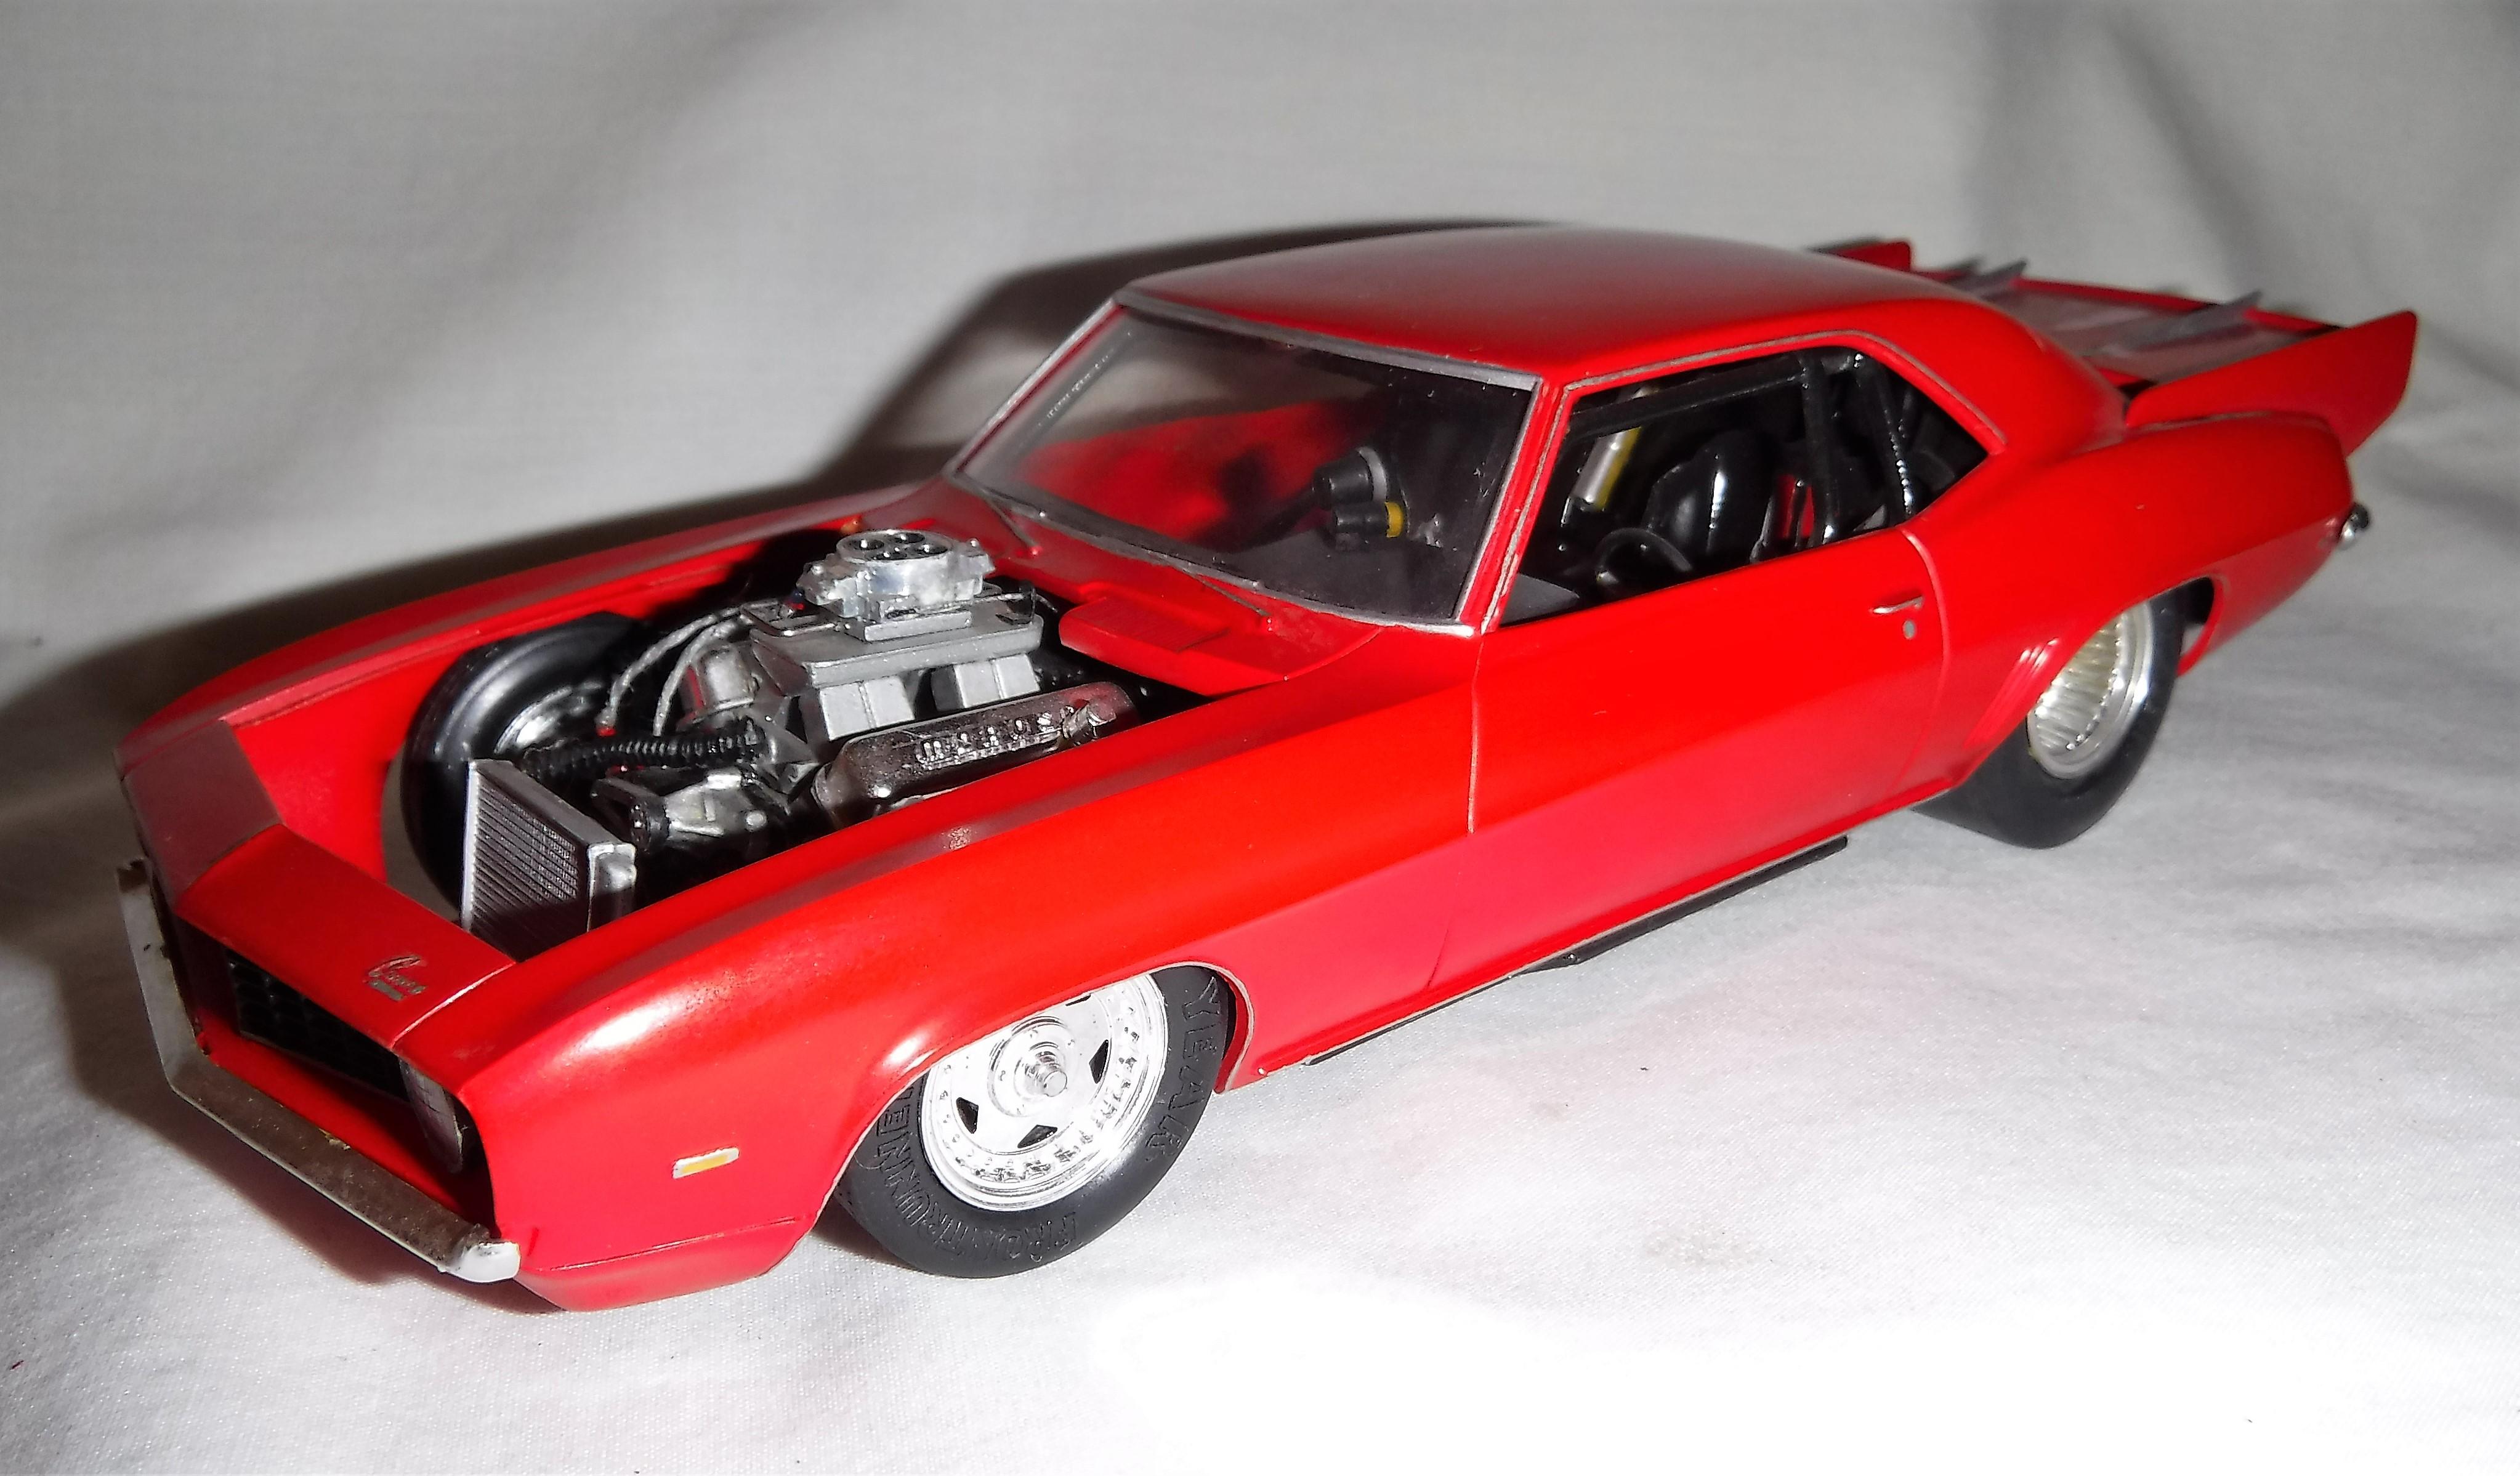 Drag 1969 Camaro - Drag Racing Models - Model Cars Magazine Forum